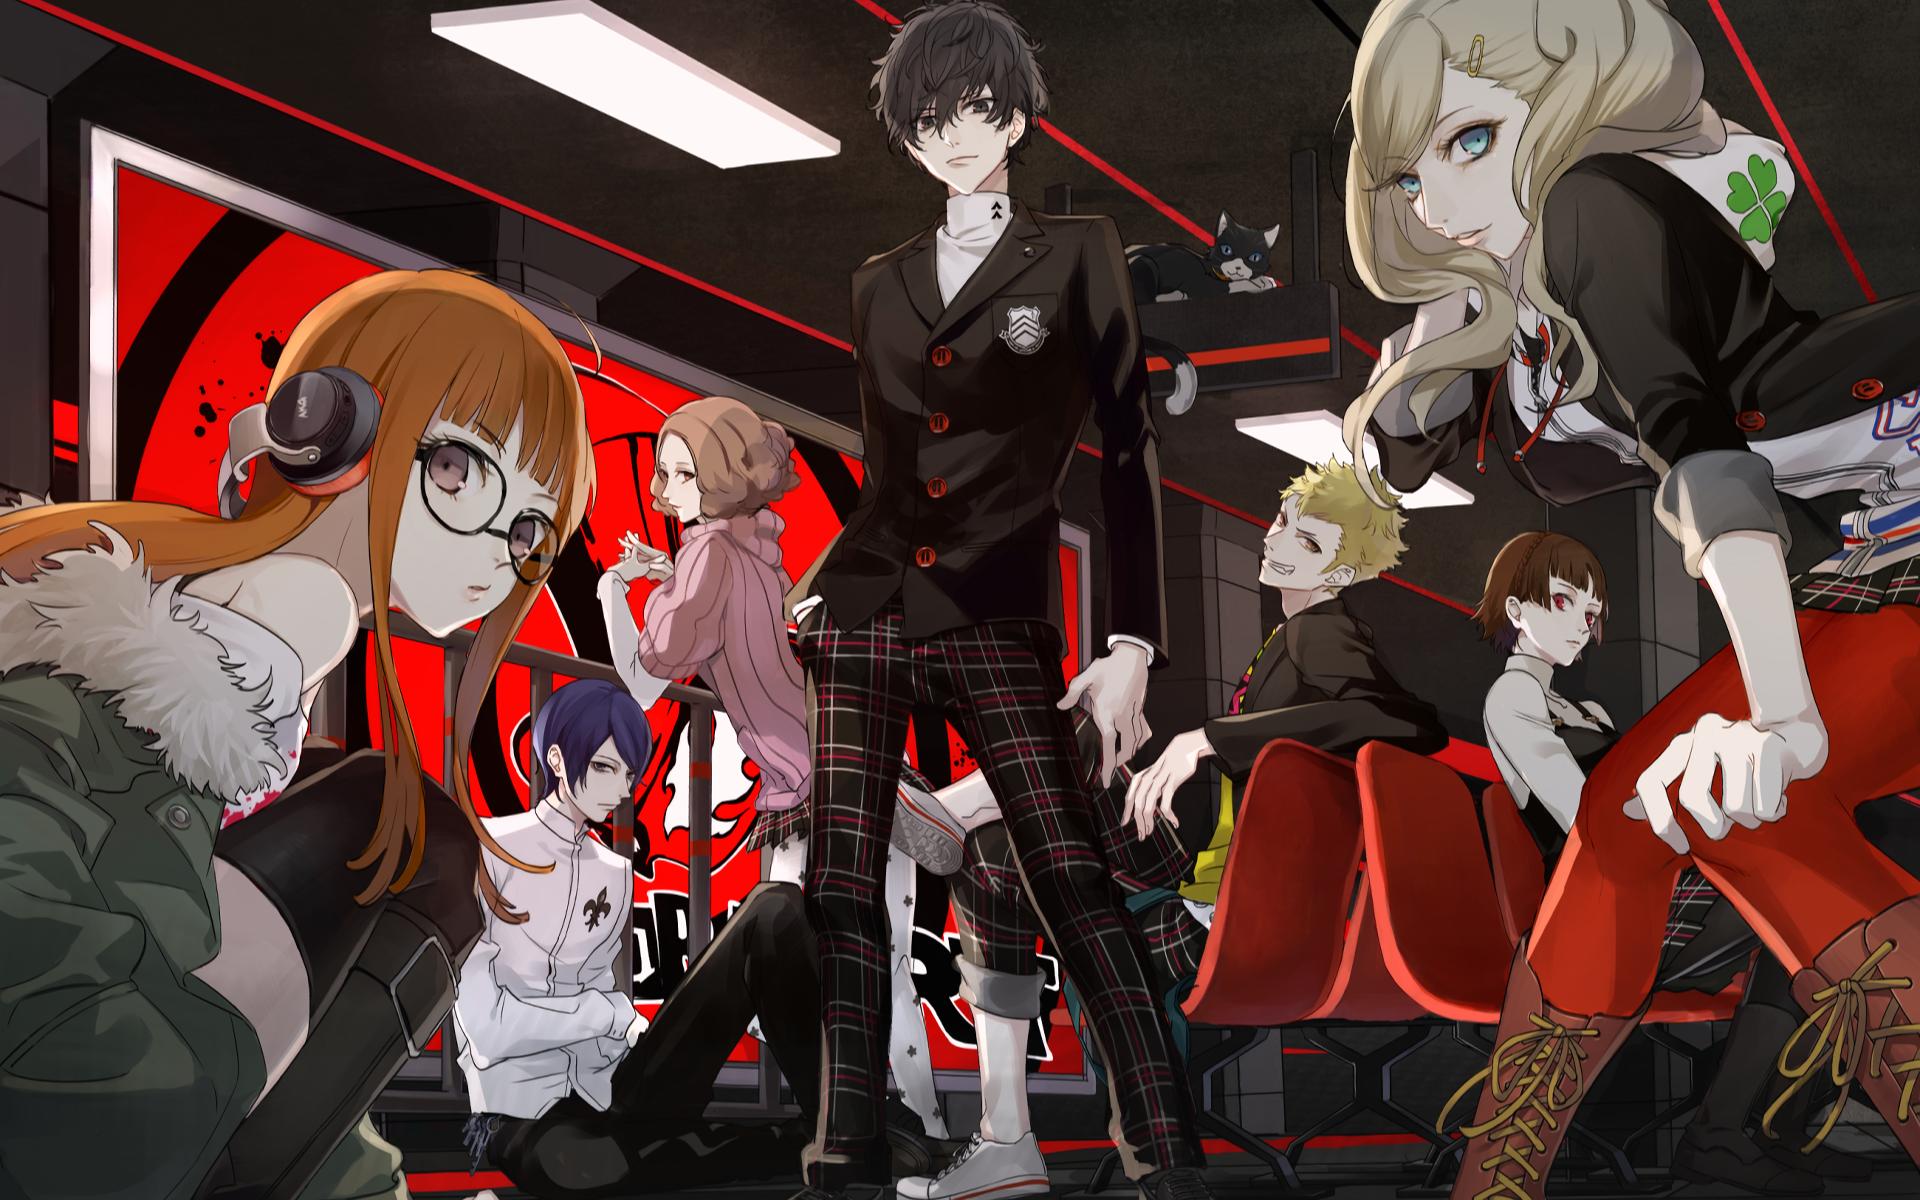 Persona 5 Persona series Phantom Thieves Akira Kurusu